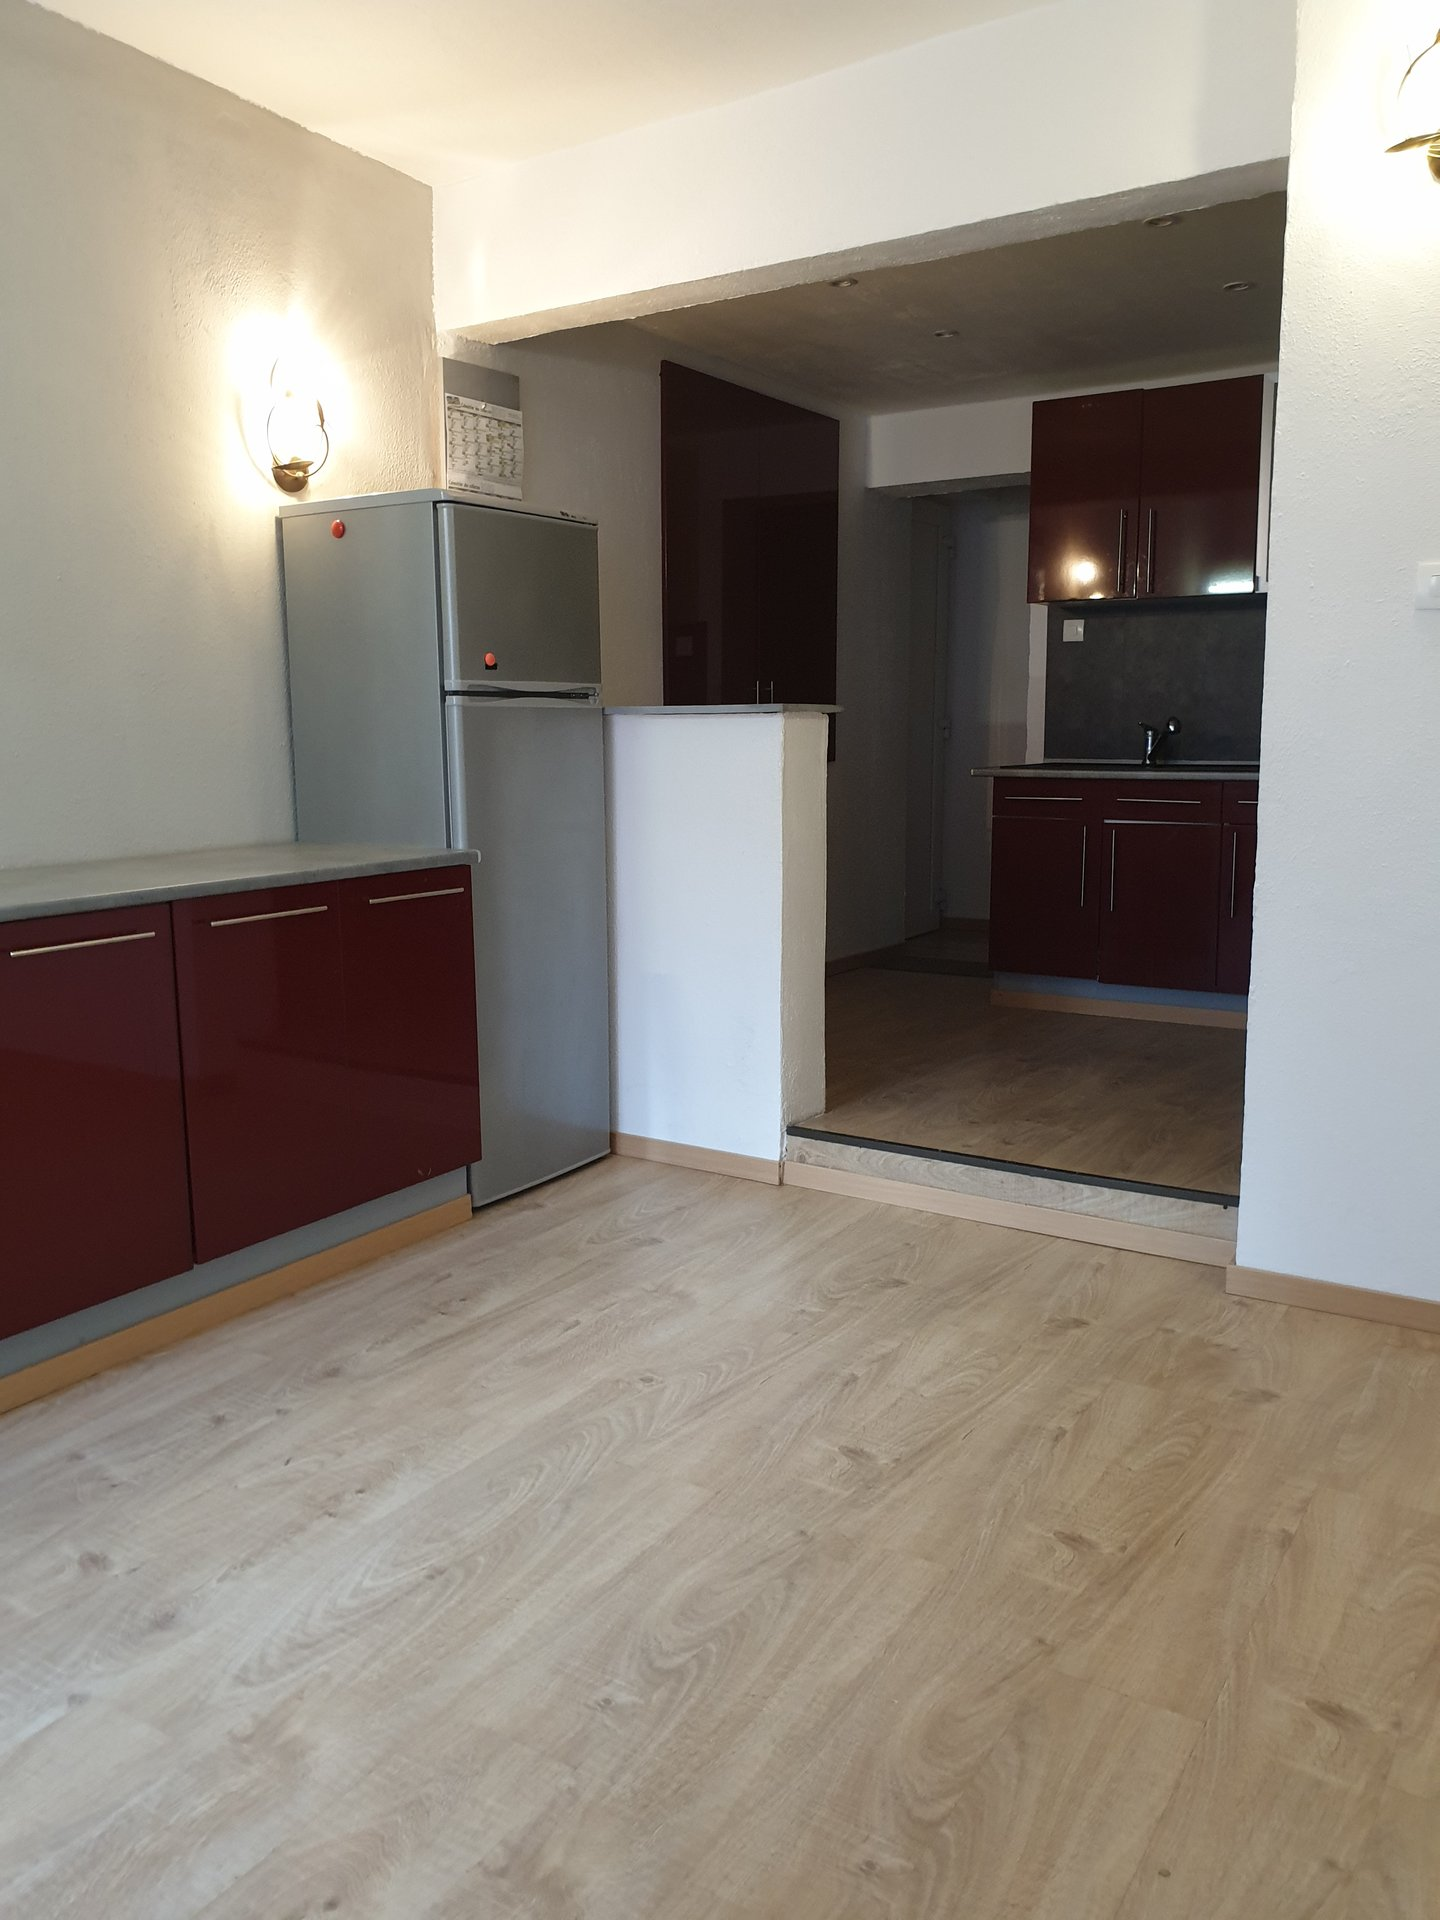 Pfaffenheim - Jolie maison de village !!